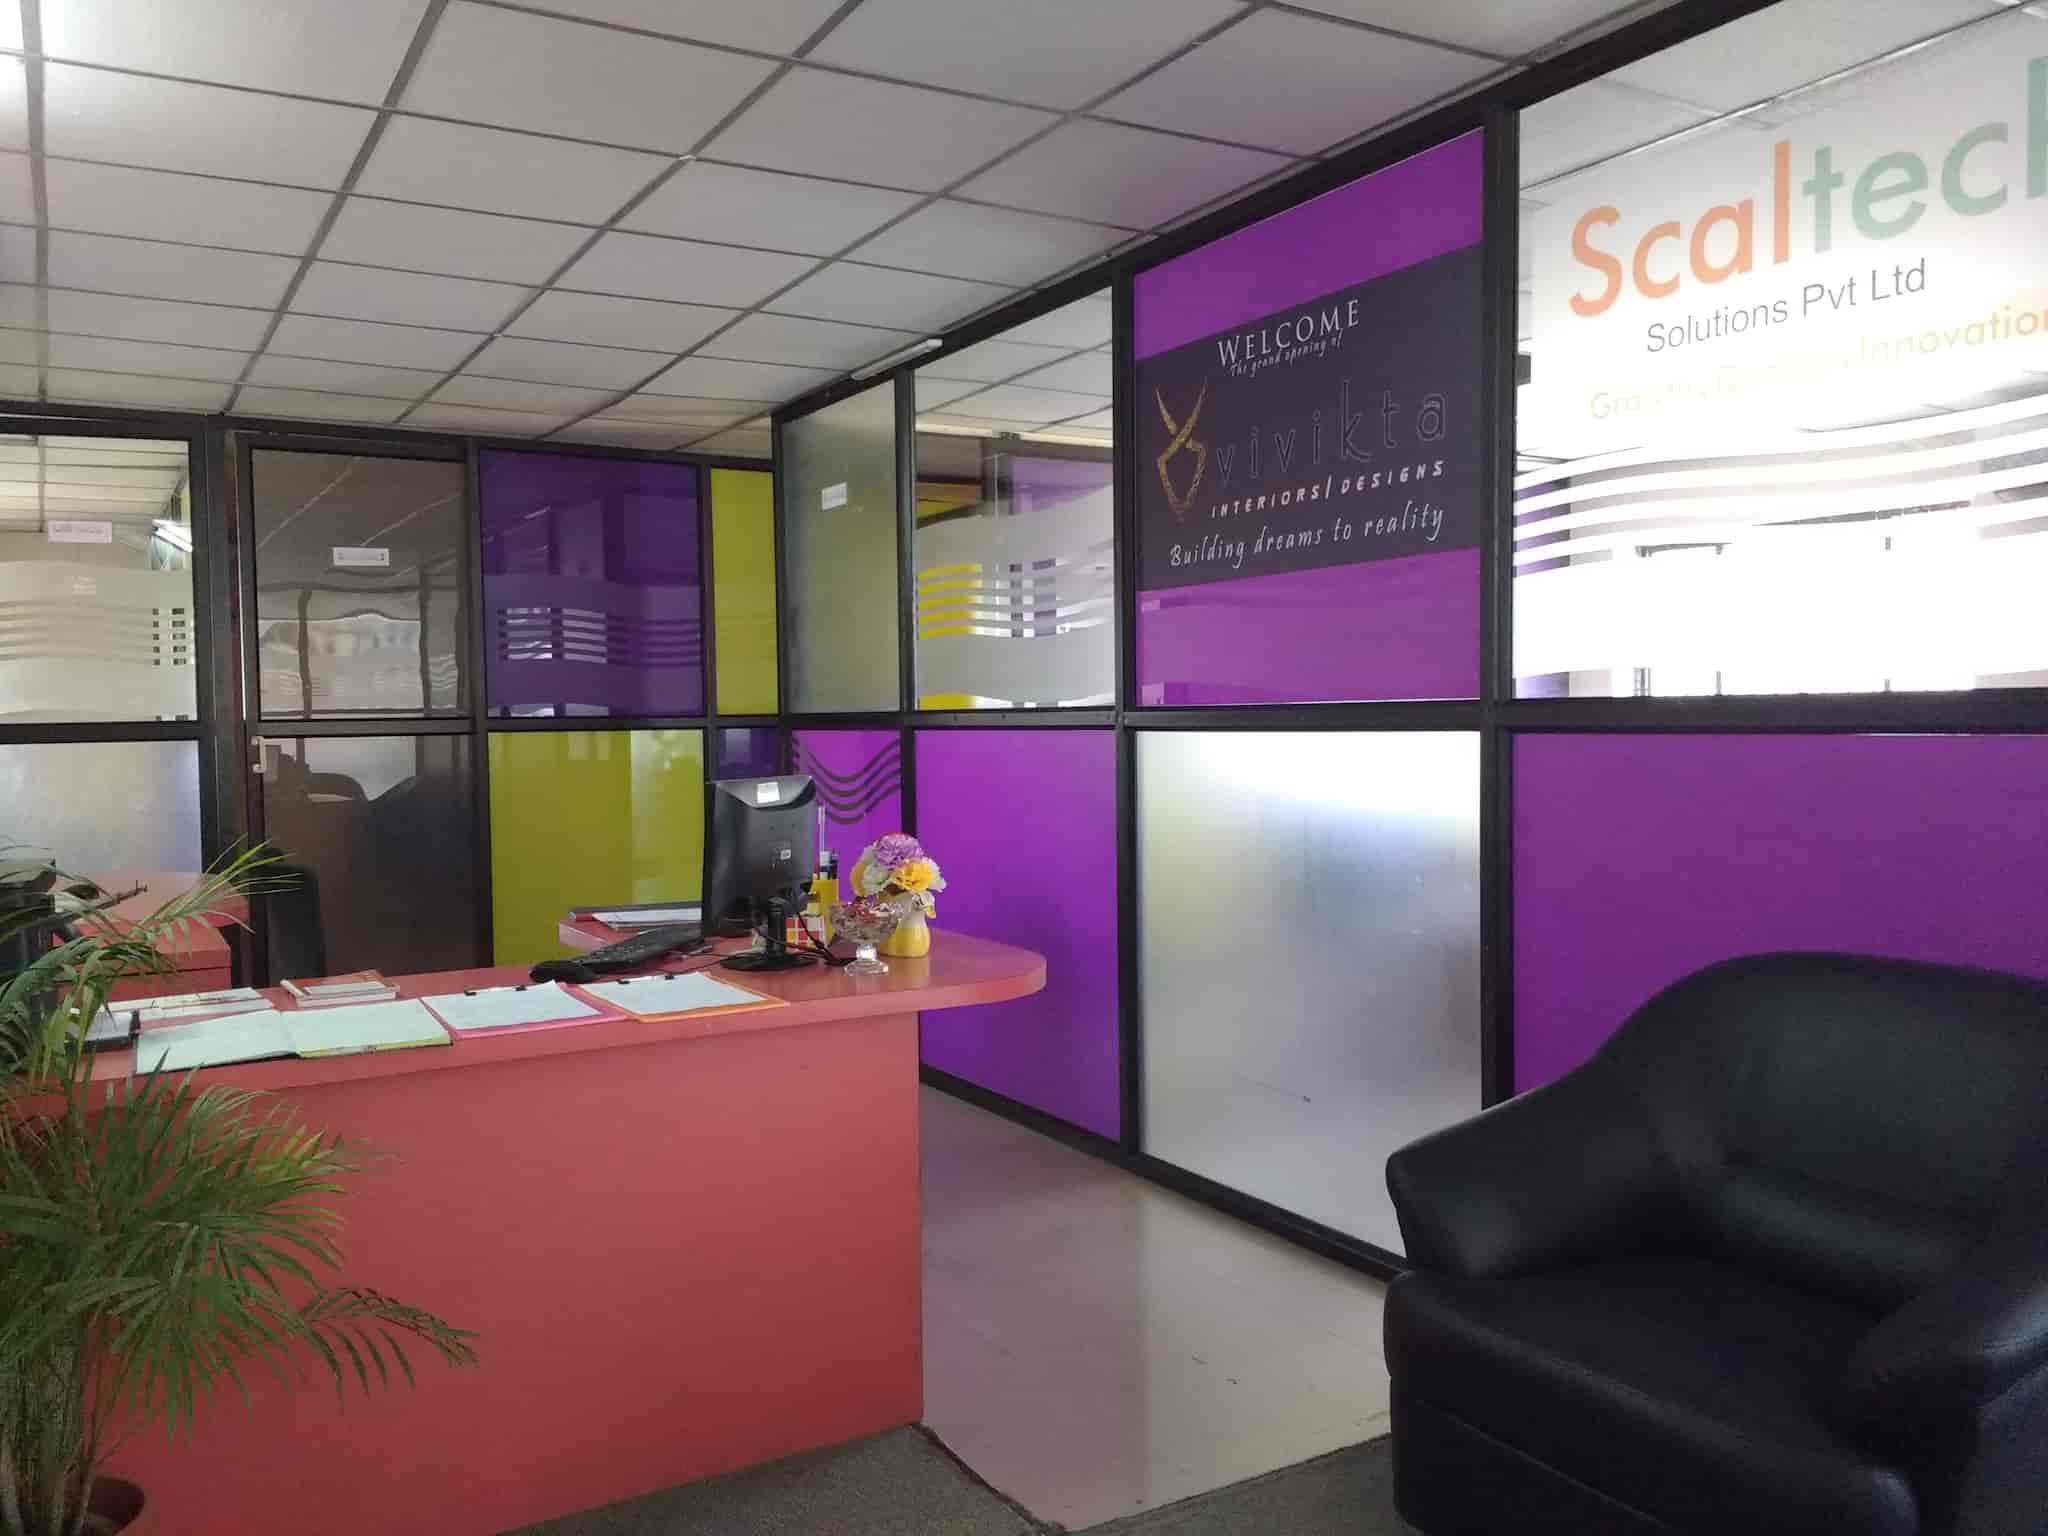 scaltech solutions pvt ltd photos marathahalli bangalore pictures